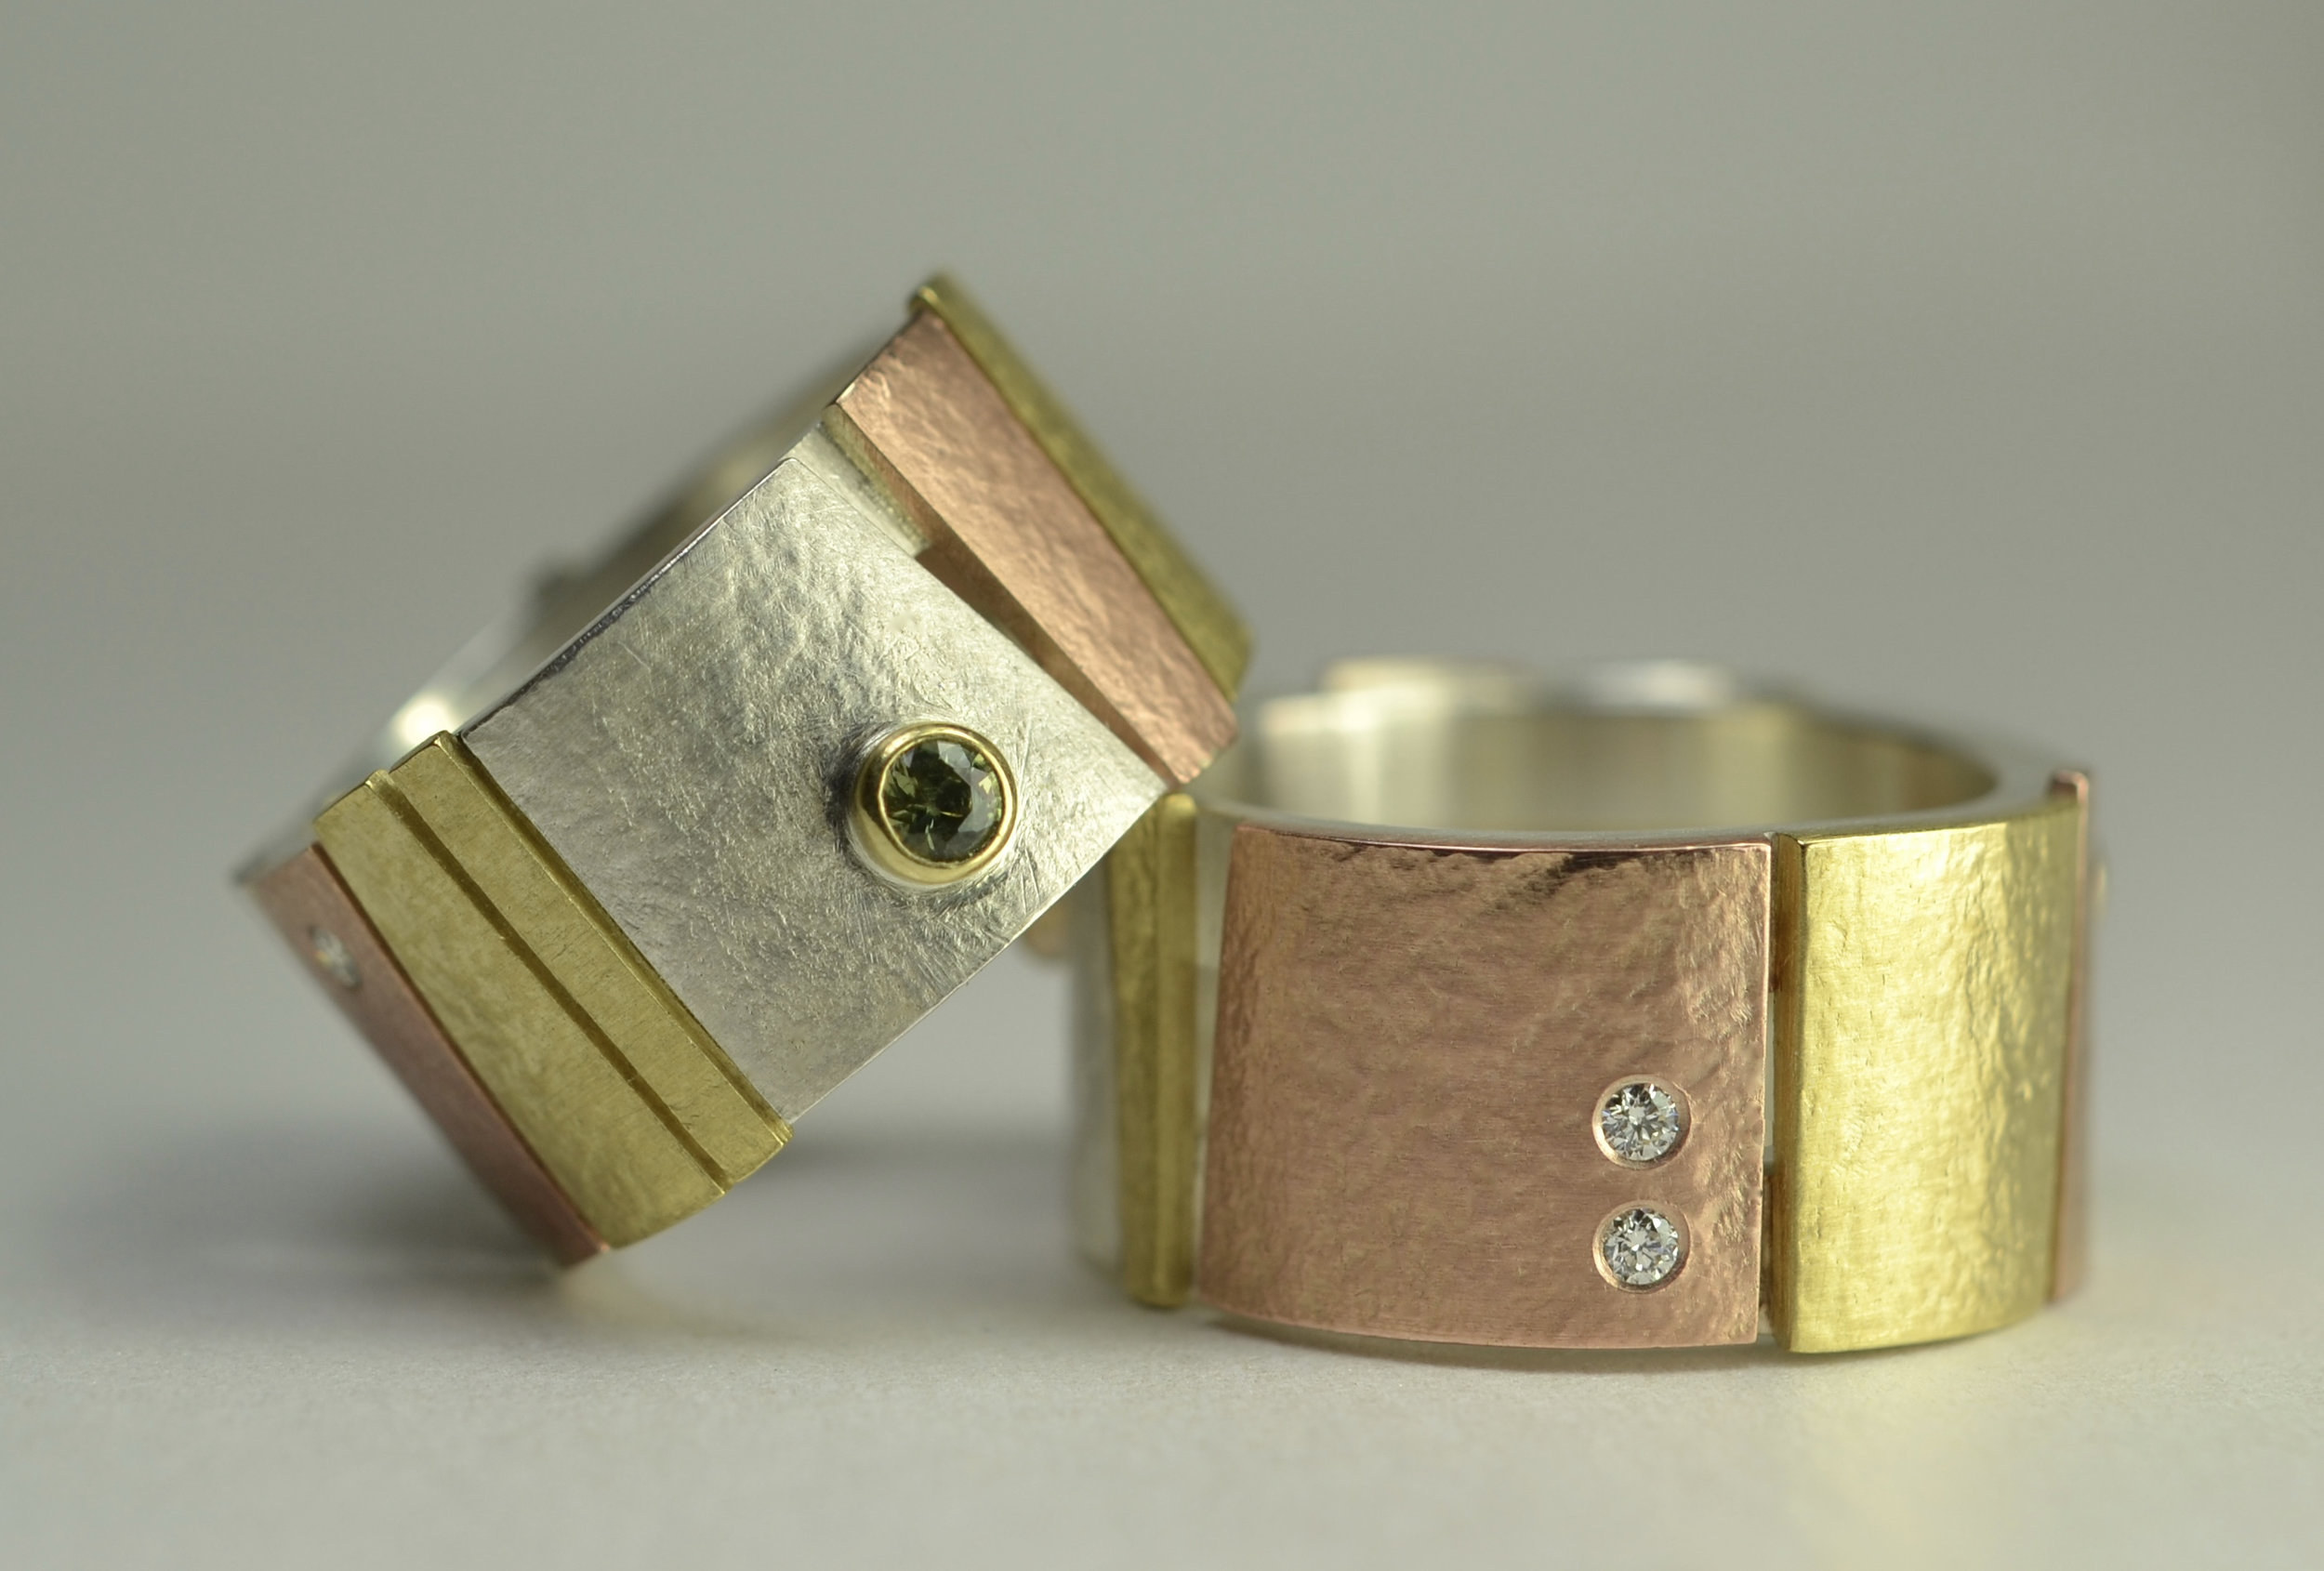 multi colored gold bands,diamond, tourmaline